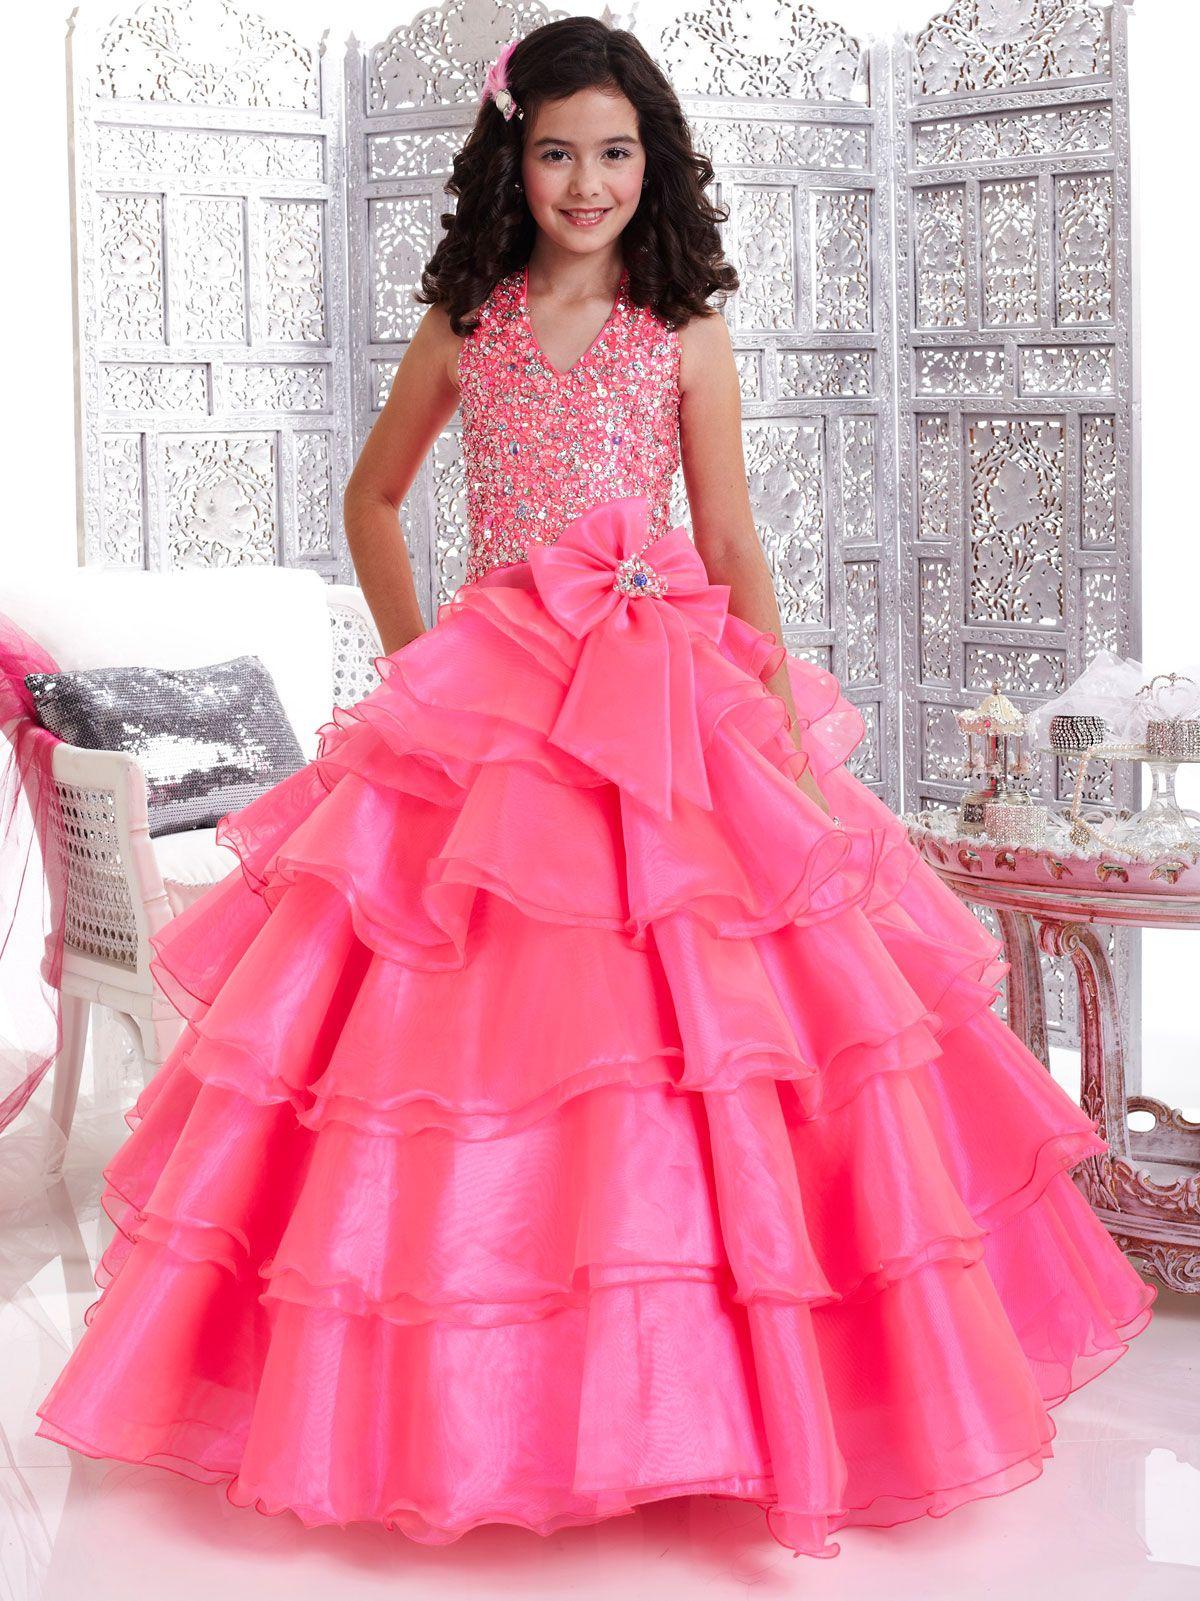 Presentacion para mis niñas. | Vestidos de fiesta para niñas ...